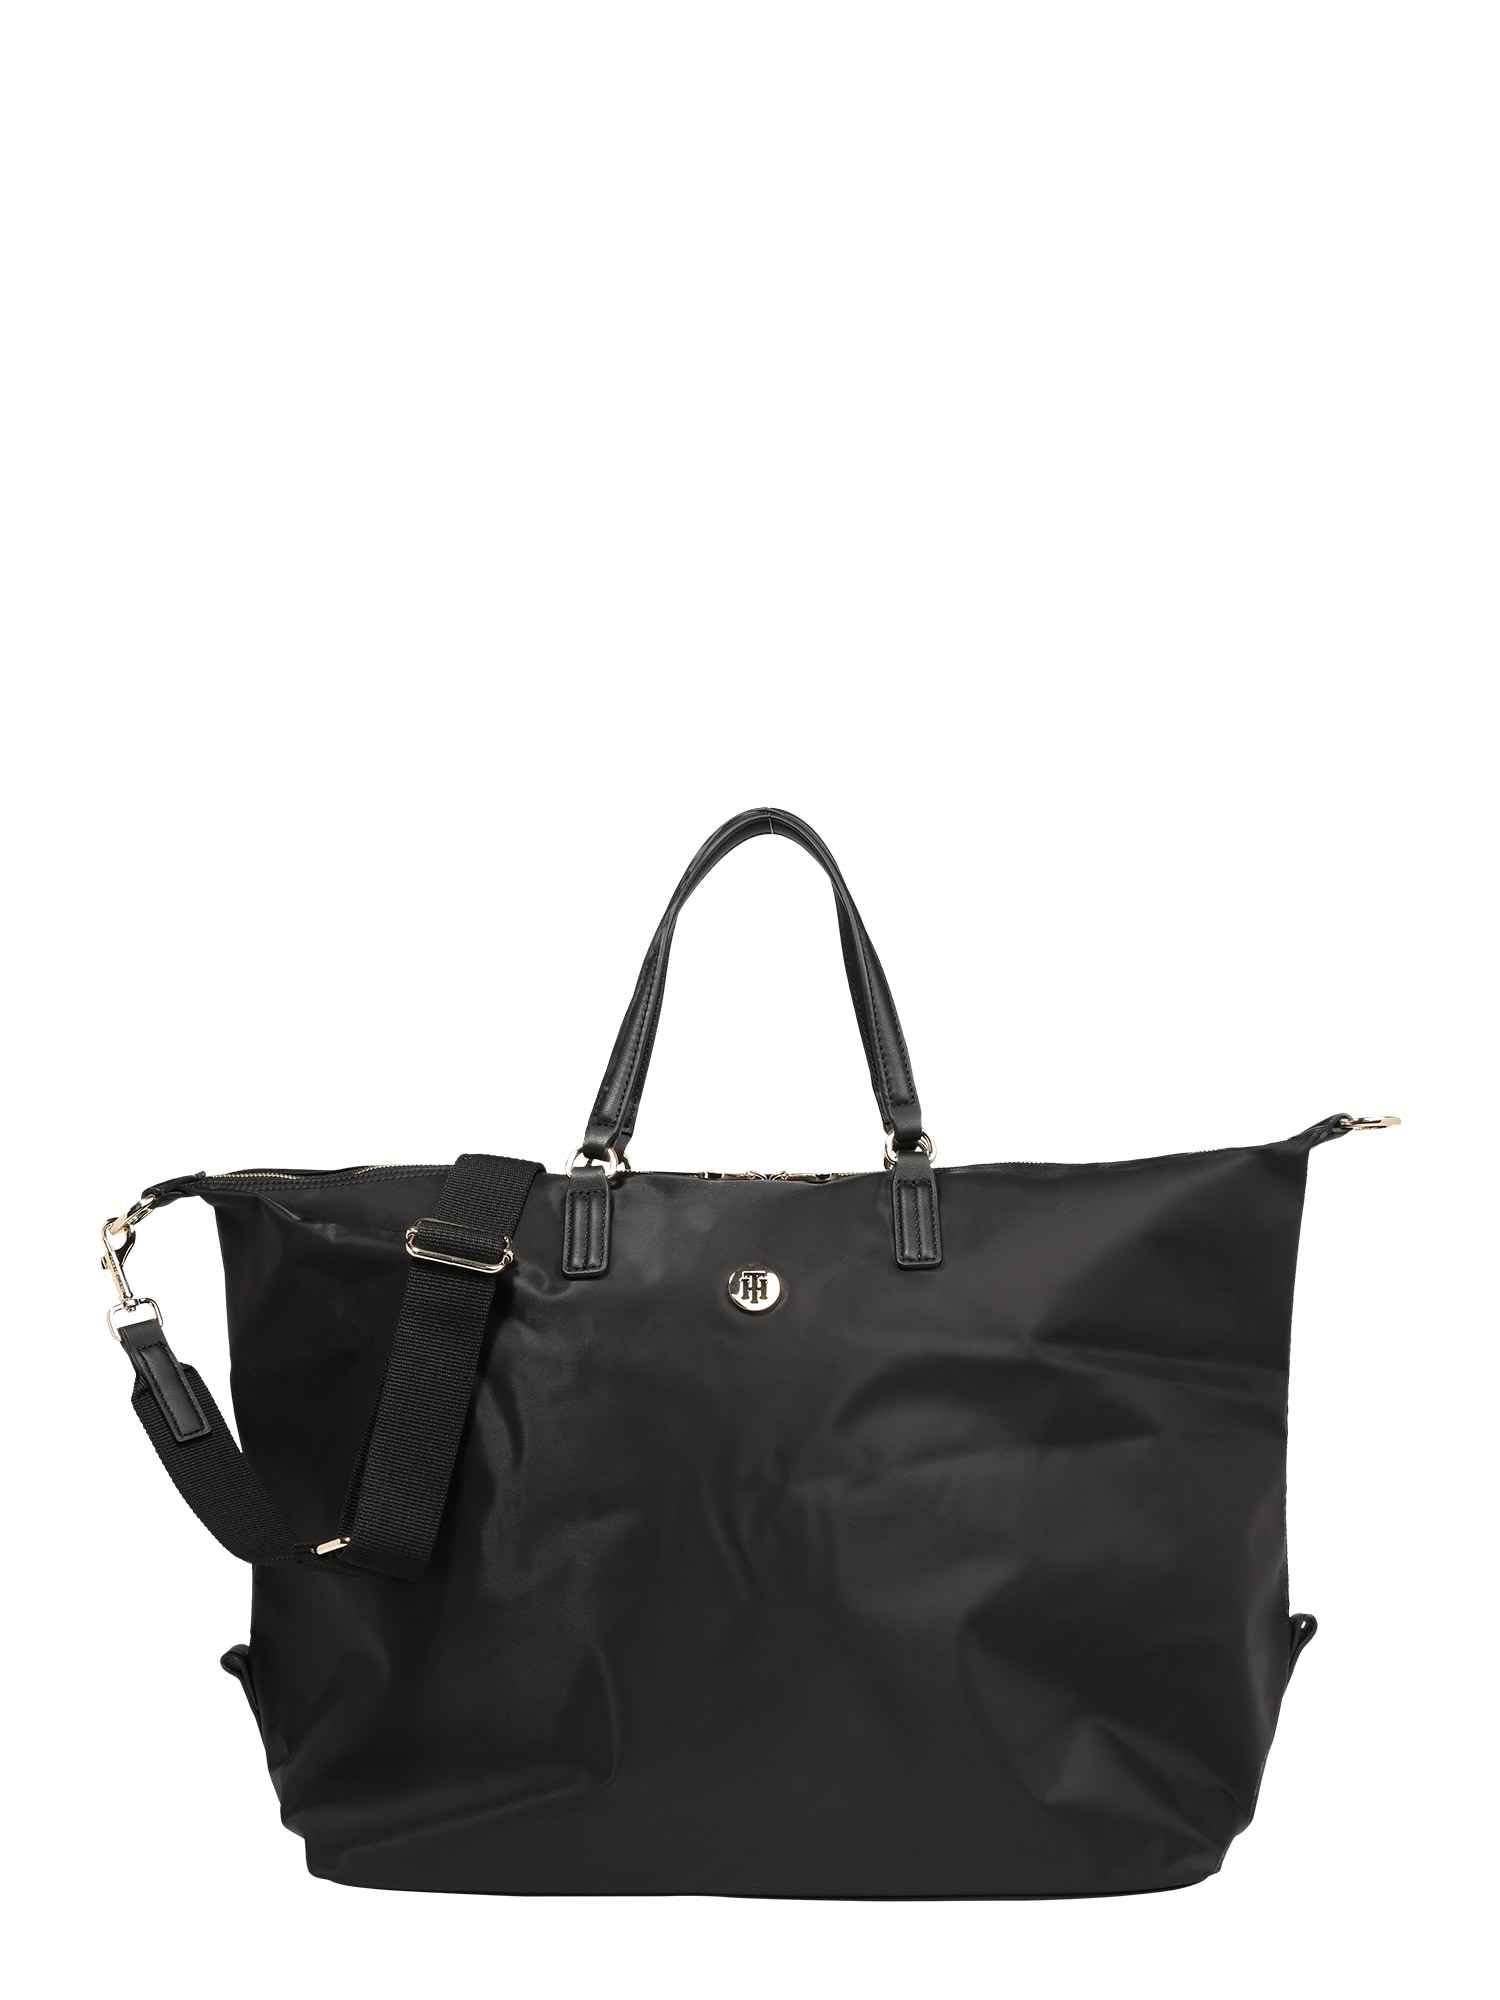 TOMMY HILFIGER Kelioninis krepšys juoda